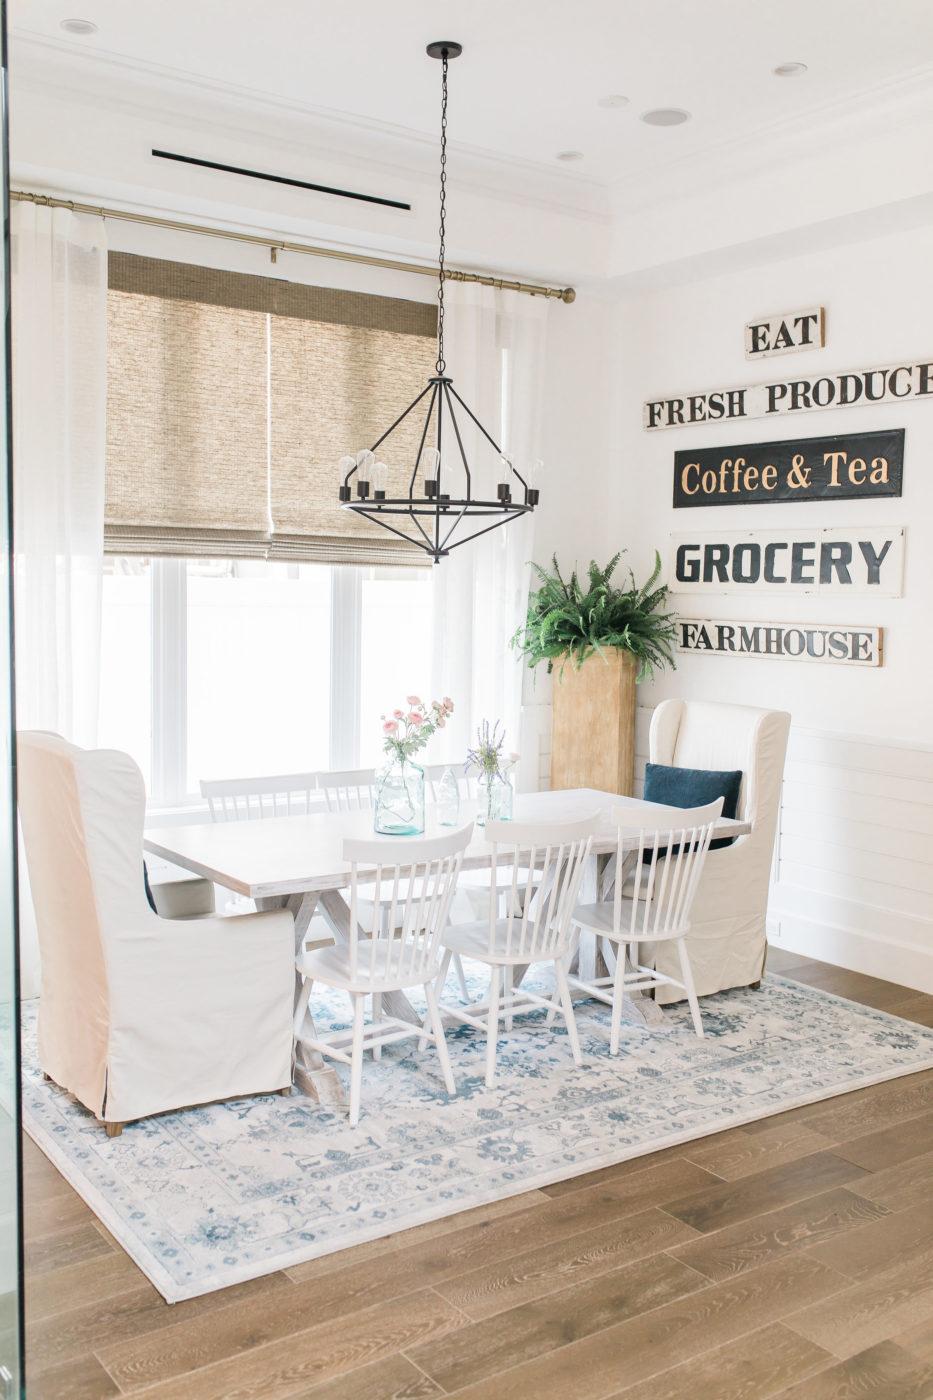 Ali Luvs Home Tour – Dining Room